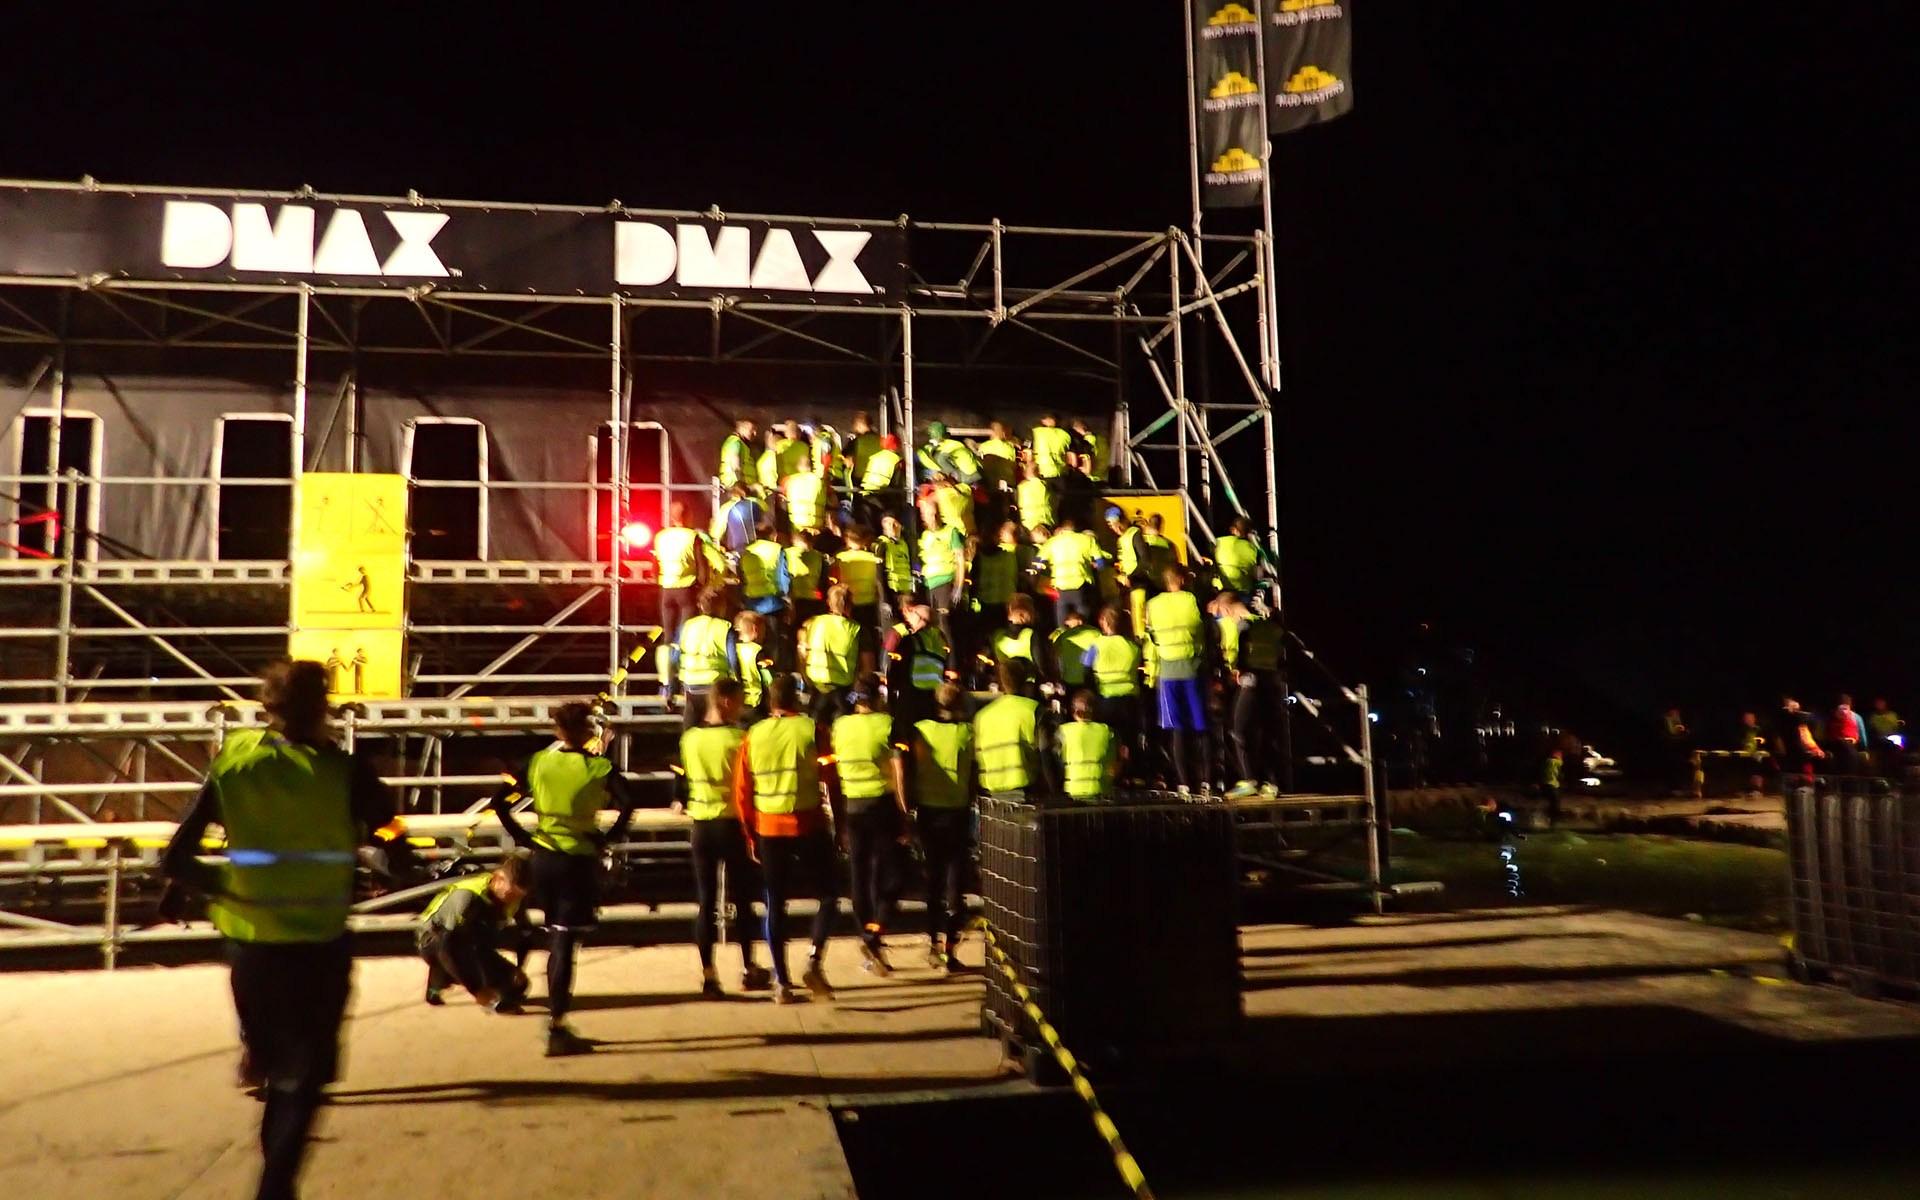 Mud Masters Obstacle, Hindernislauf Deutschland, Hindernis Execution by night